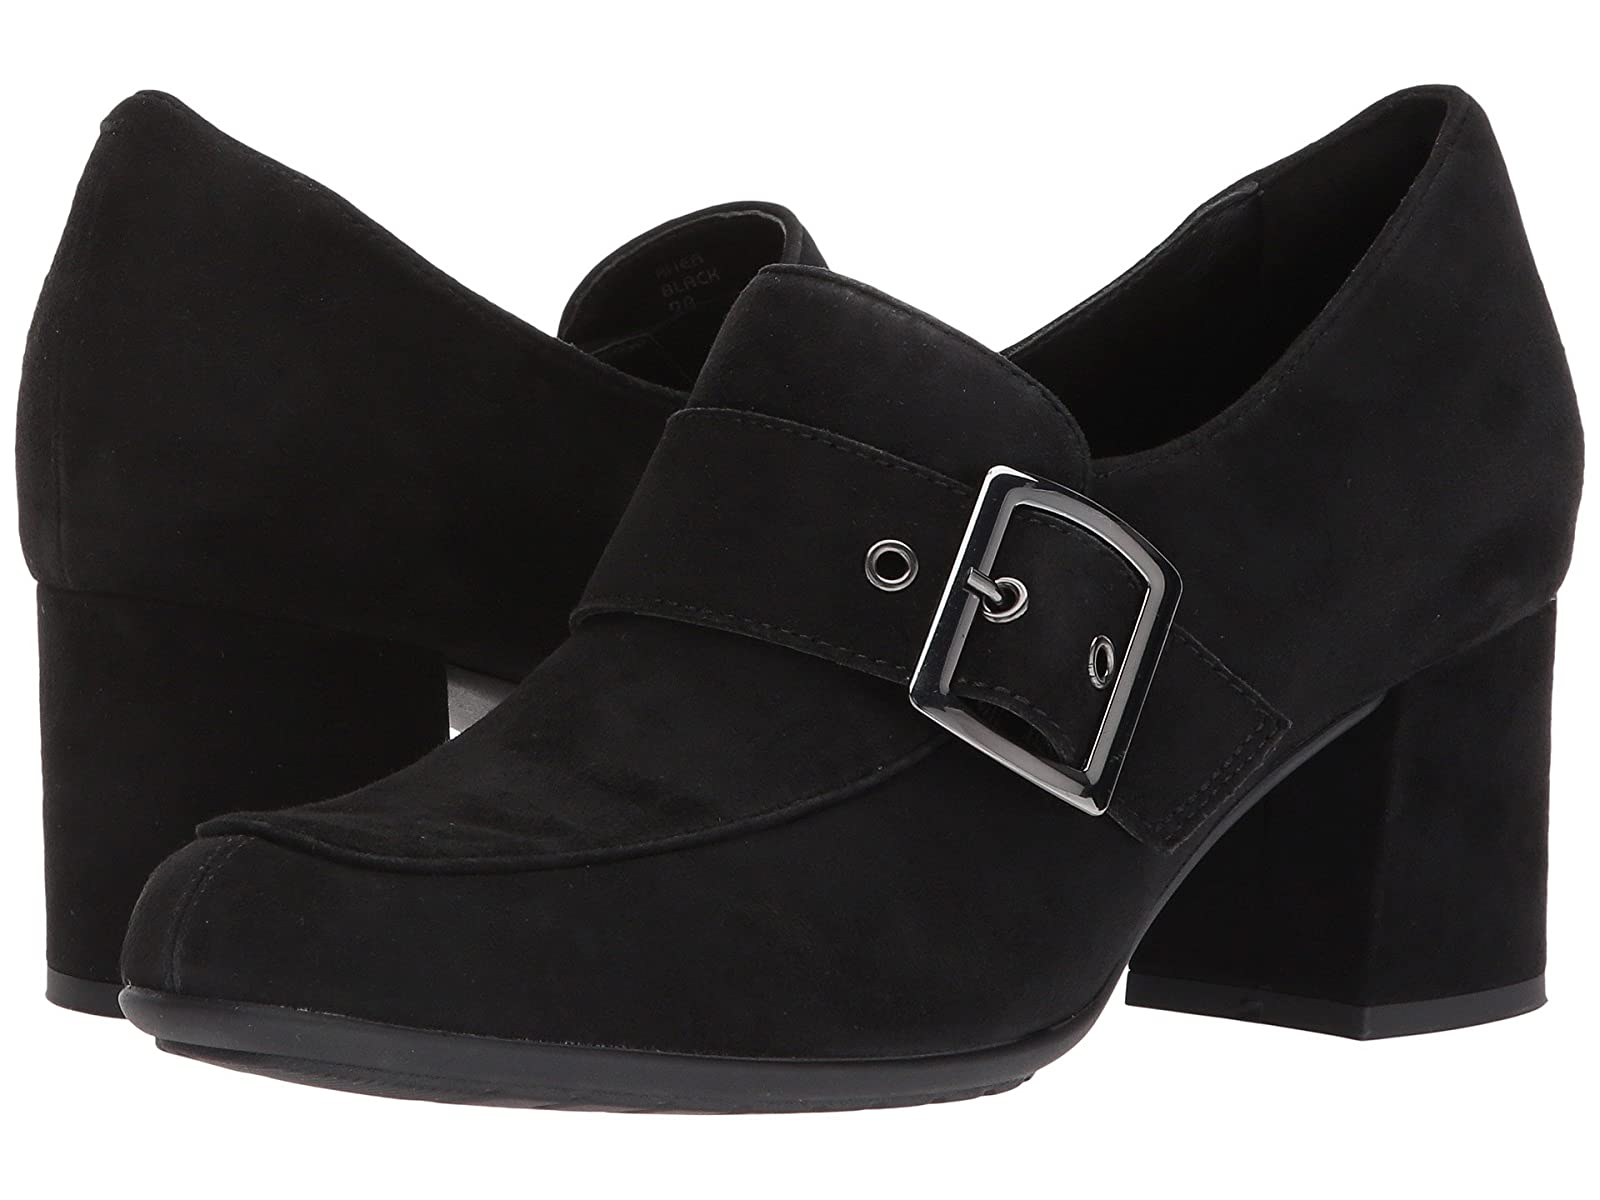 Earth Rhea EarthiesCheap and distinctive eye-catching shoes